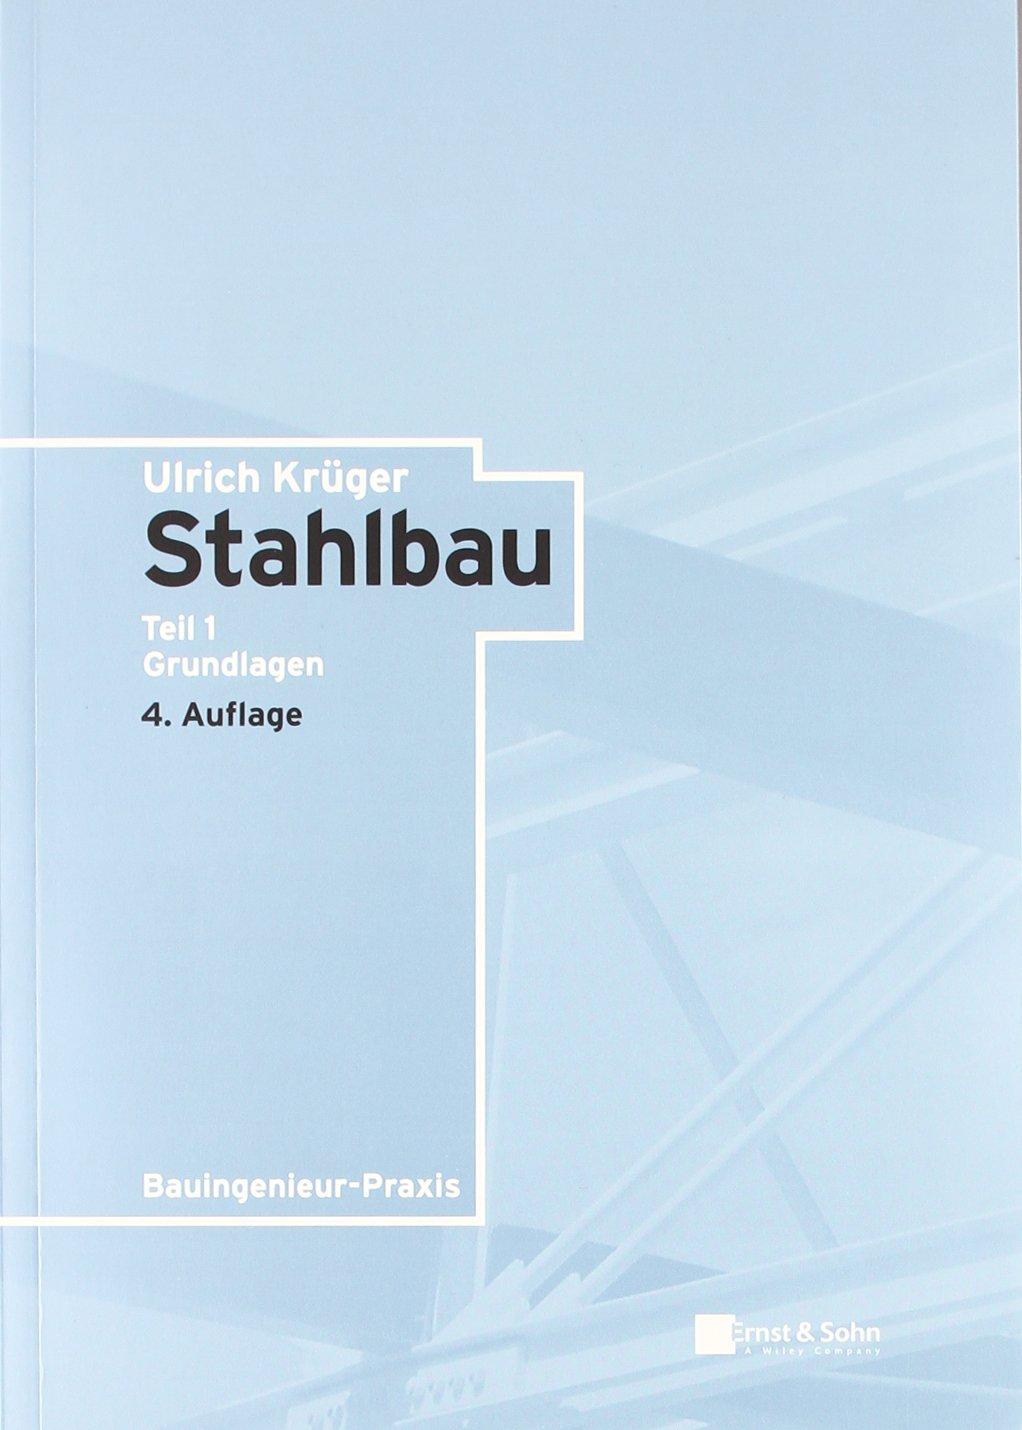 Stahlbau (Bauingenieur-Praxis) (German Edition) 6144k8W8XFL._SL1430_